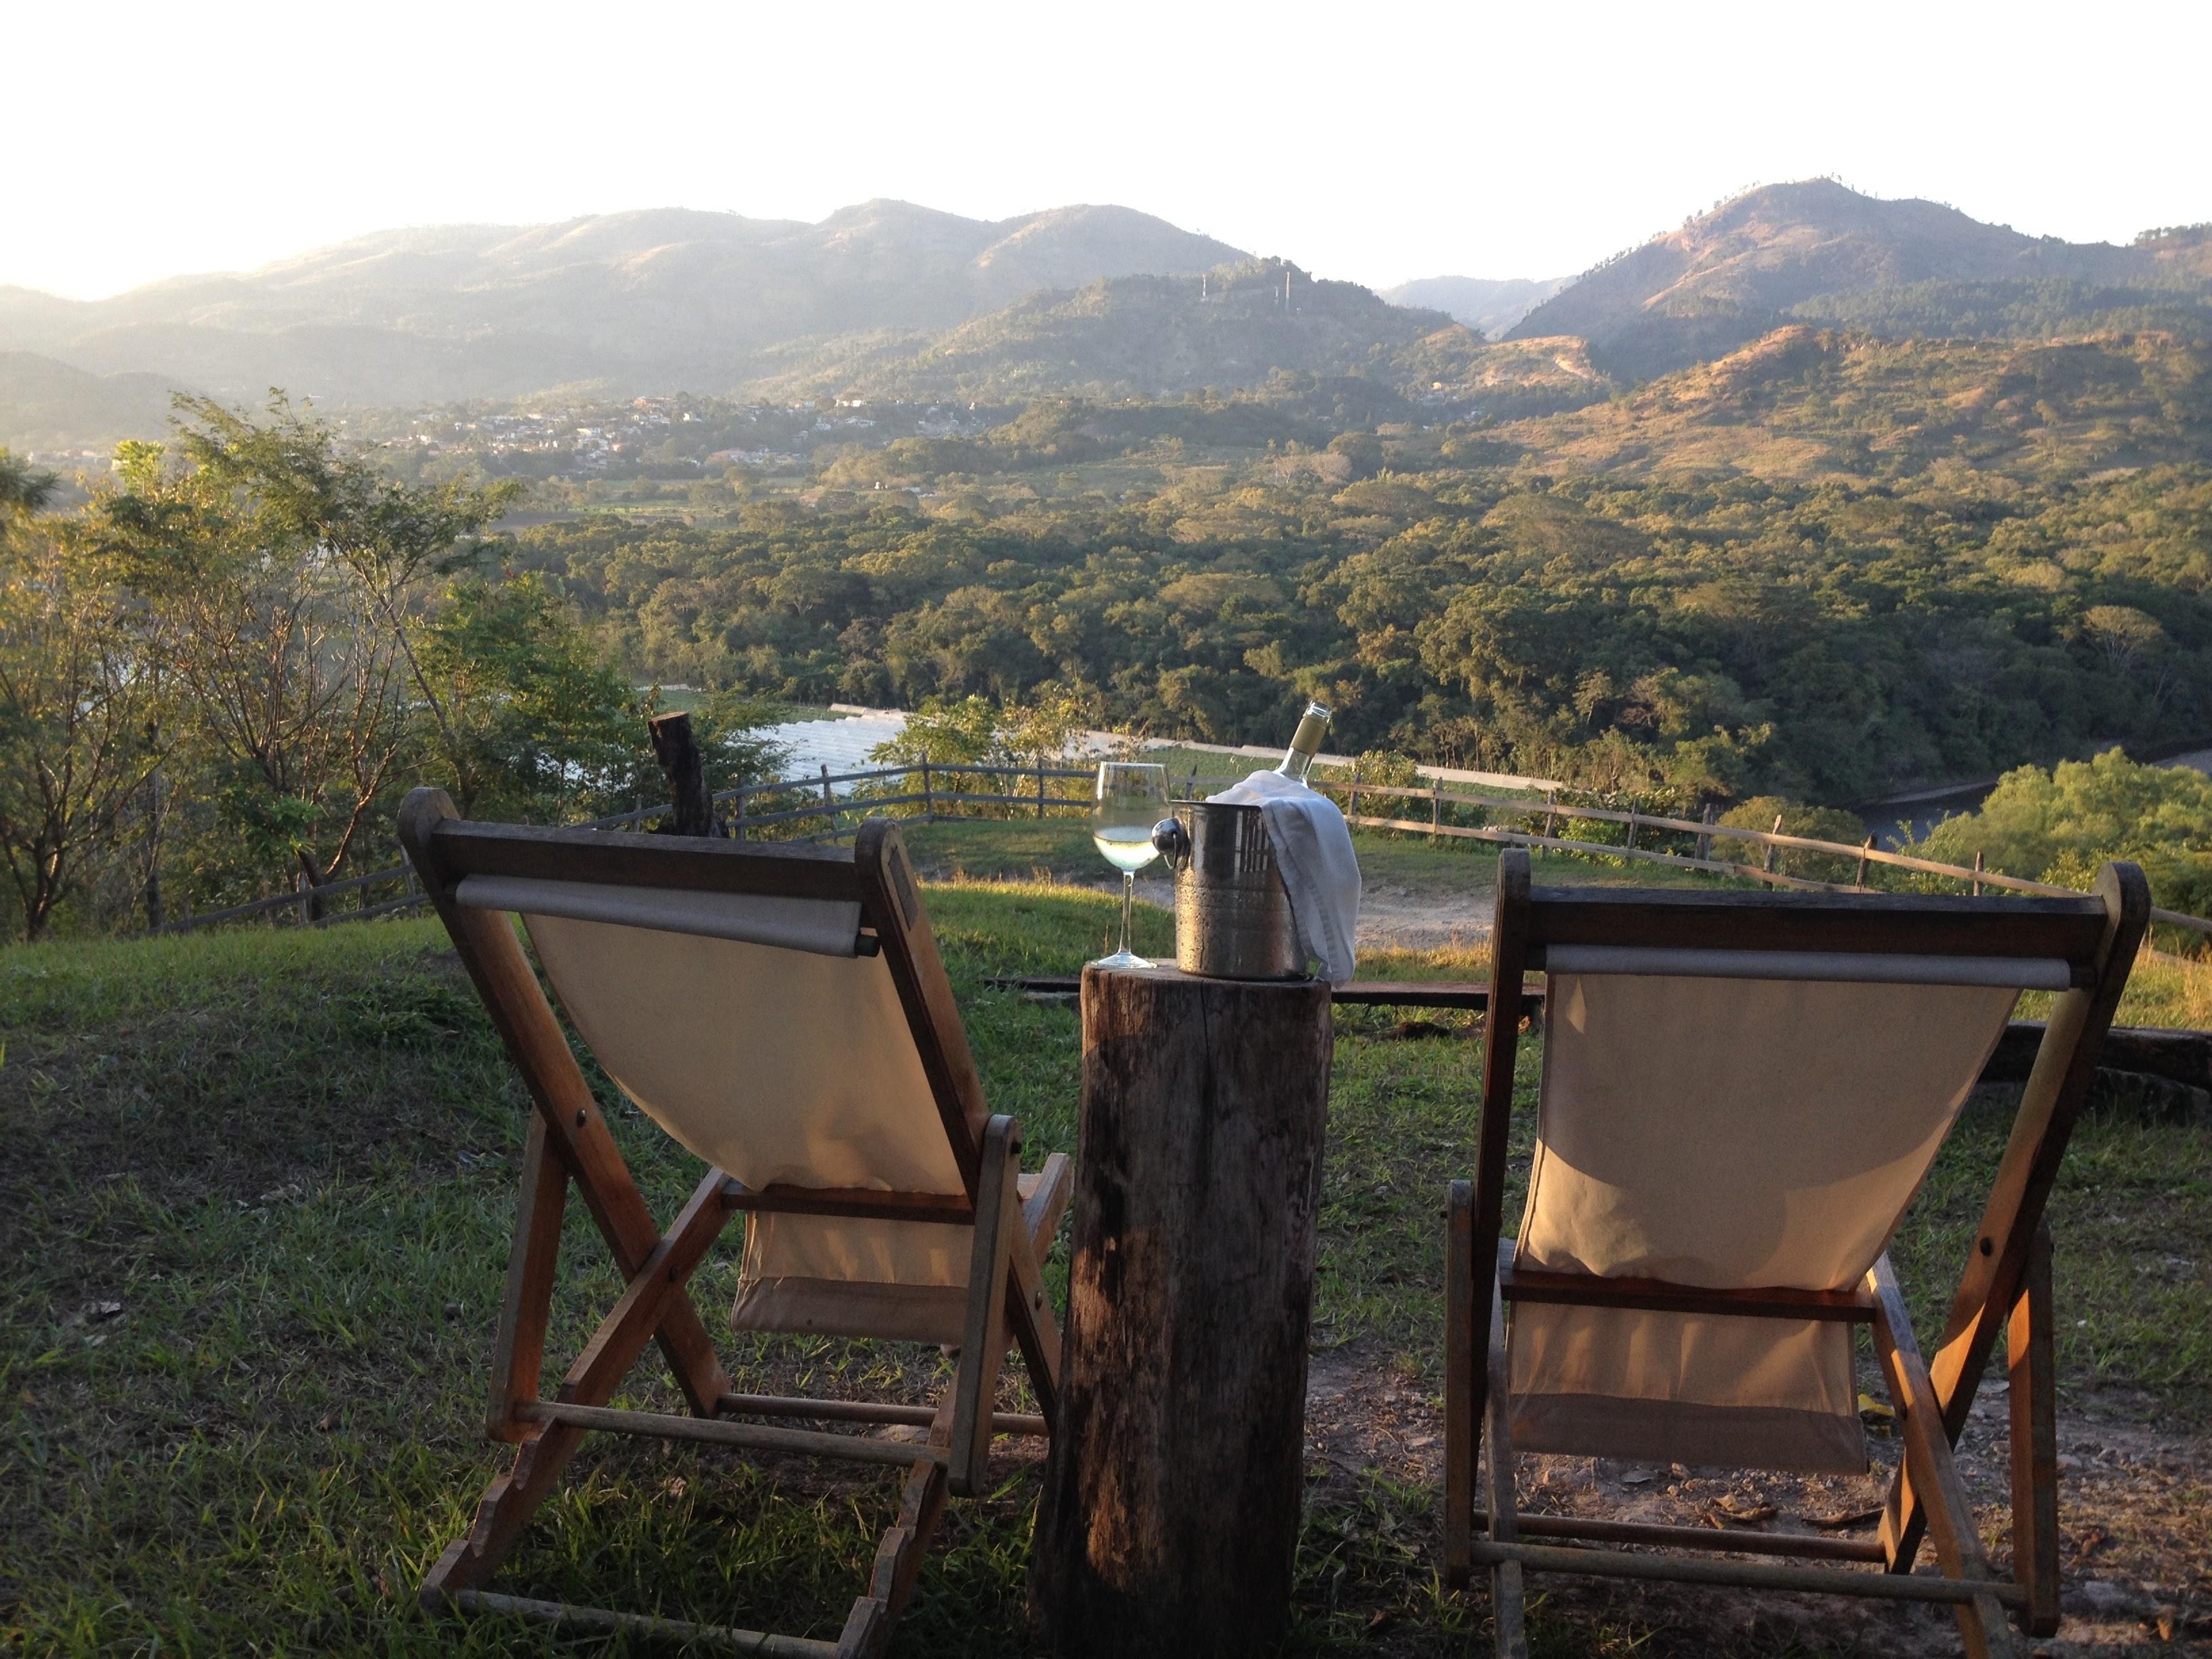 Hacienda San Lucas with Viaventure